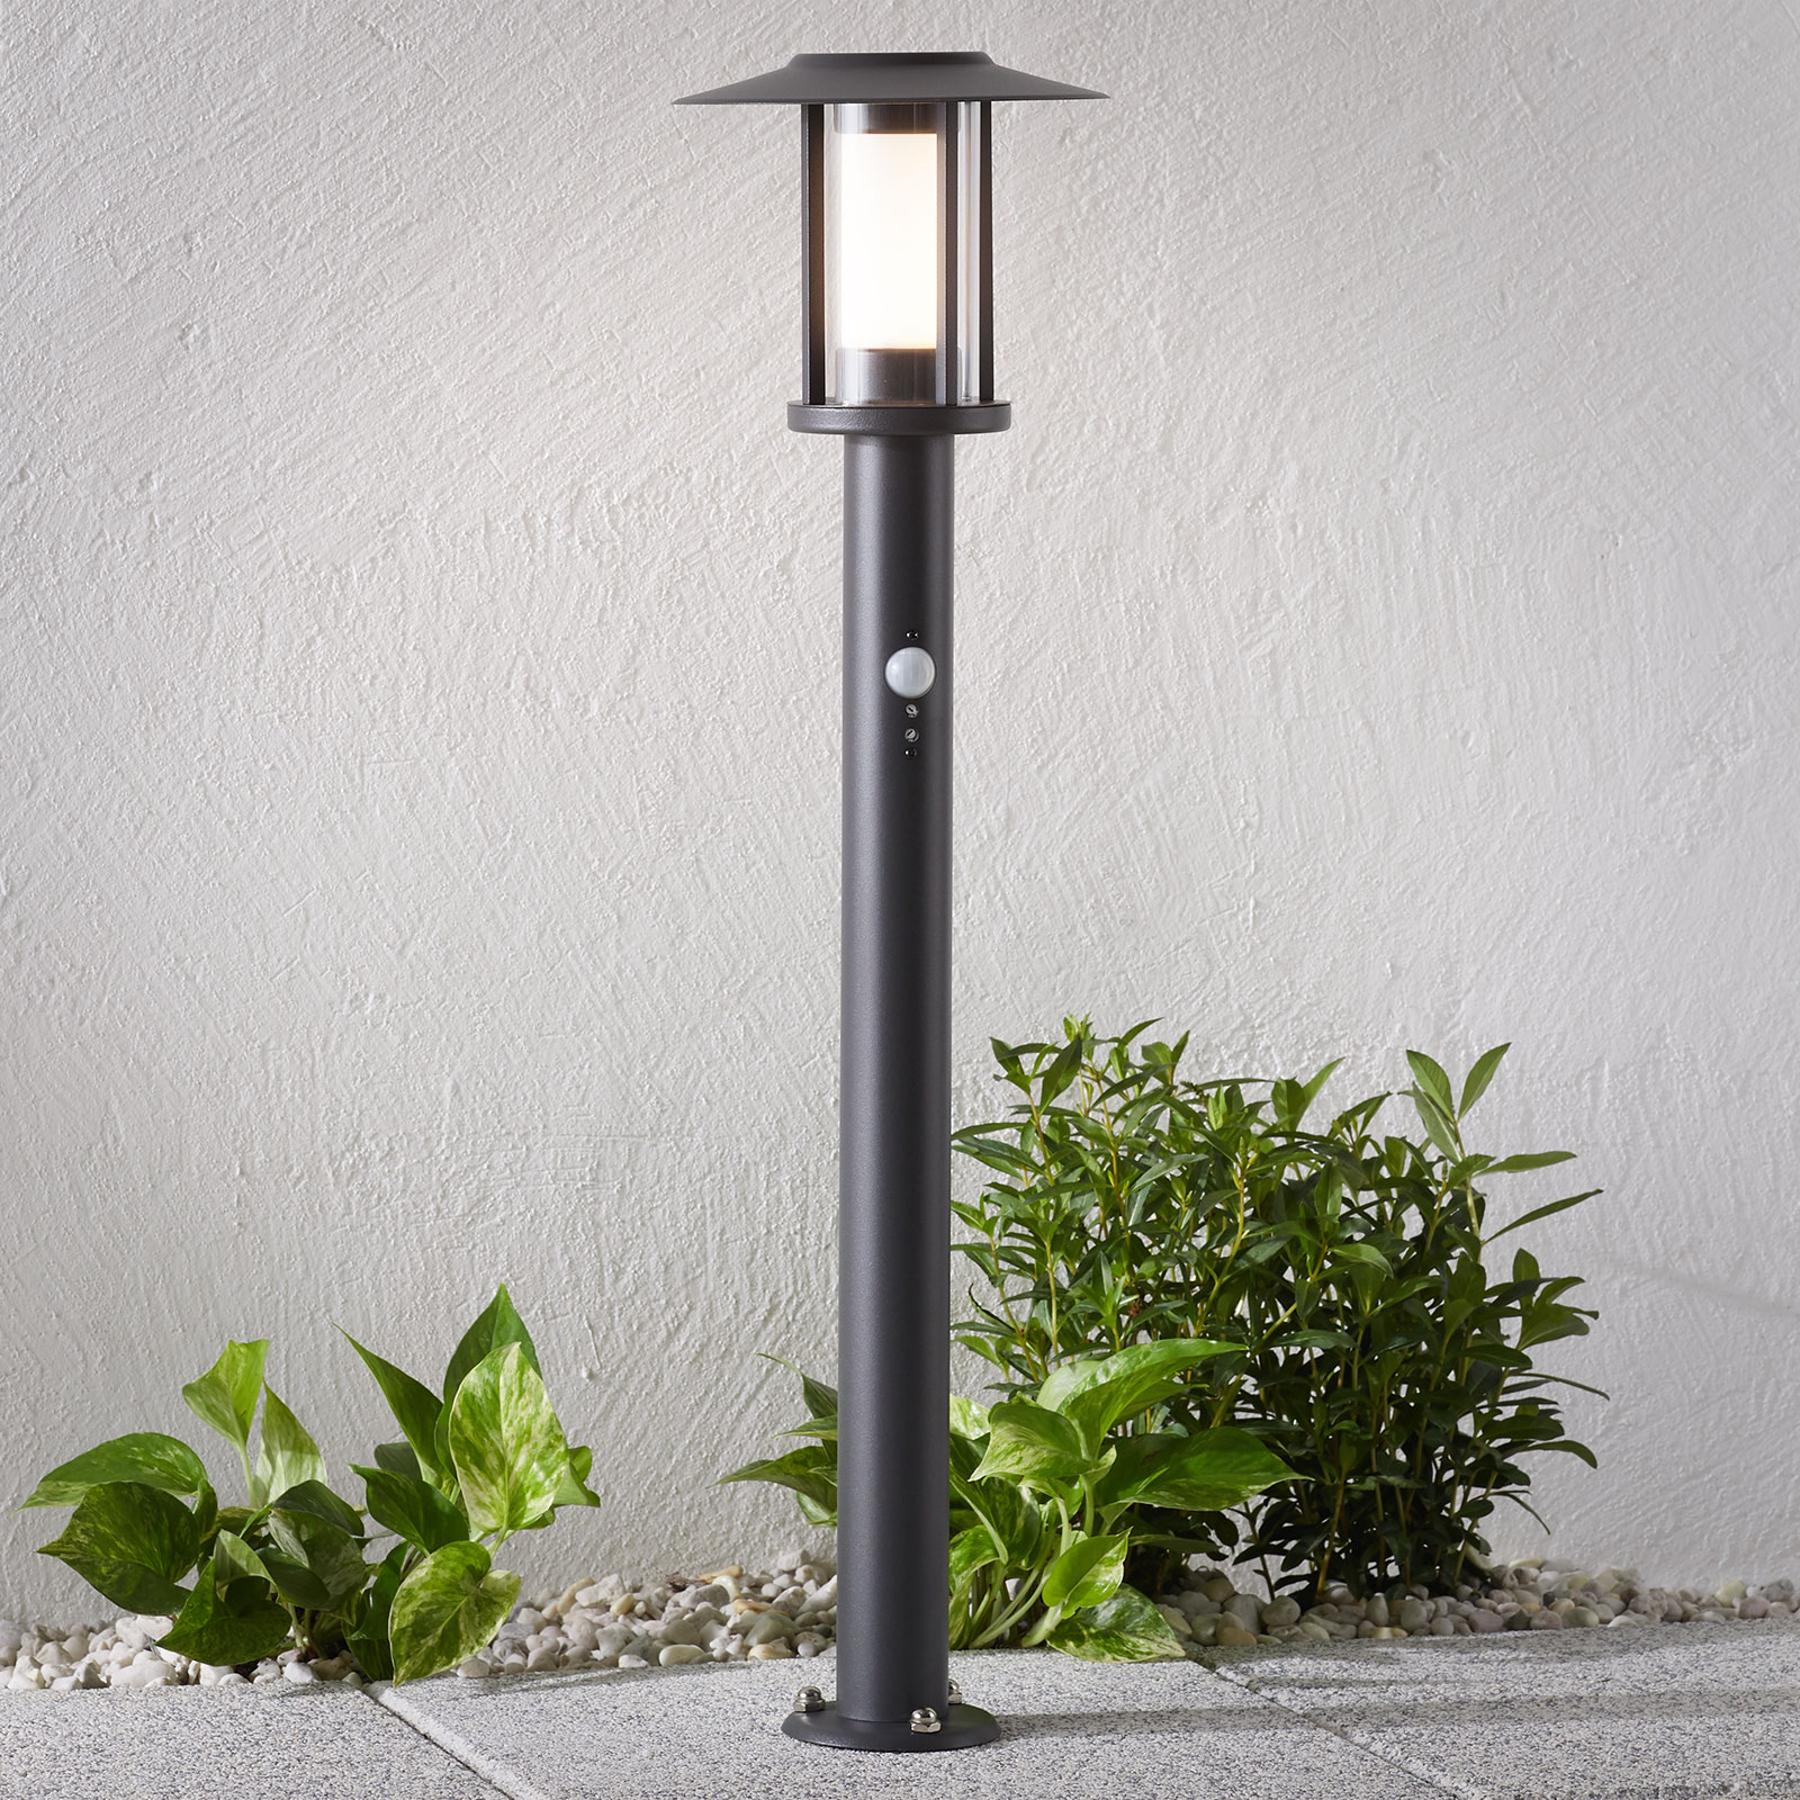 LED-Wegeleuchte Gregory, dunkelgrau, mit Sensor